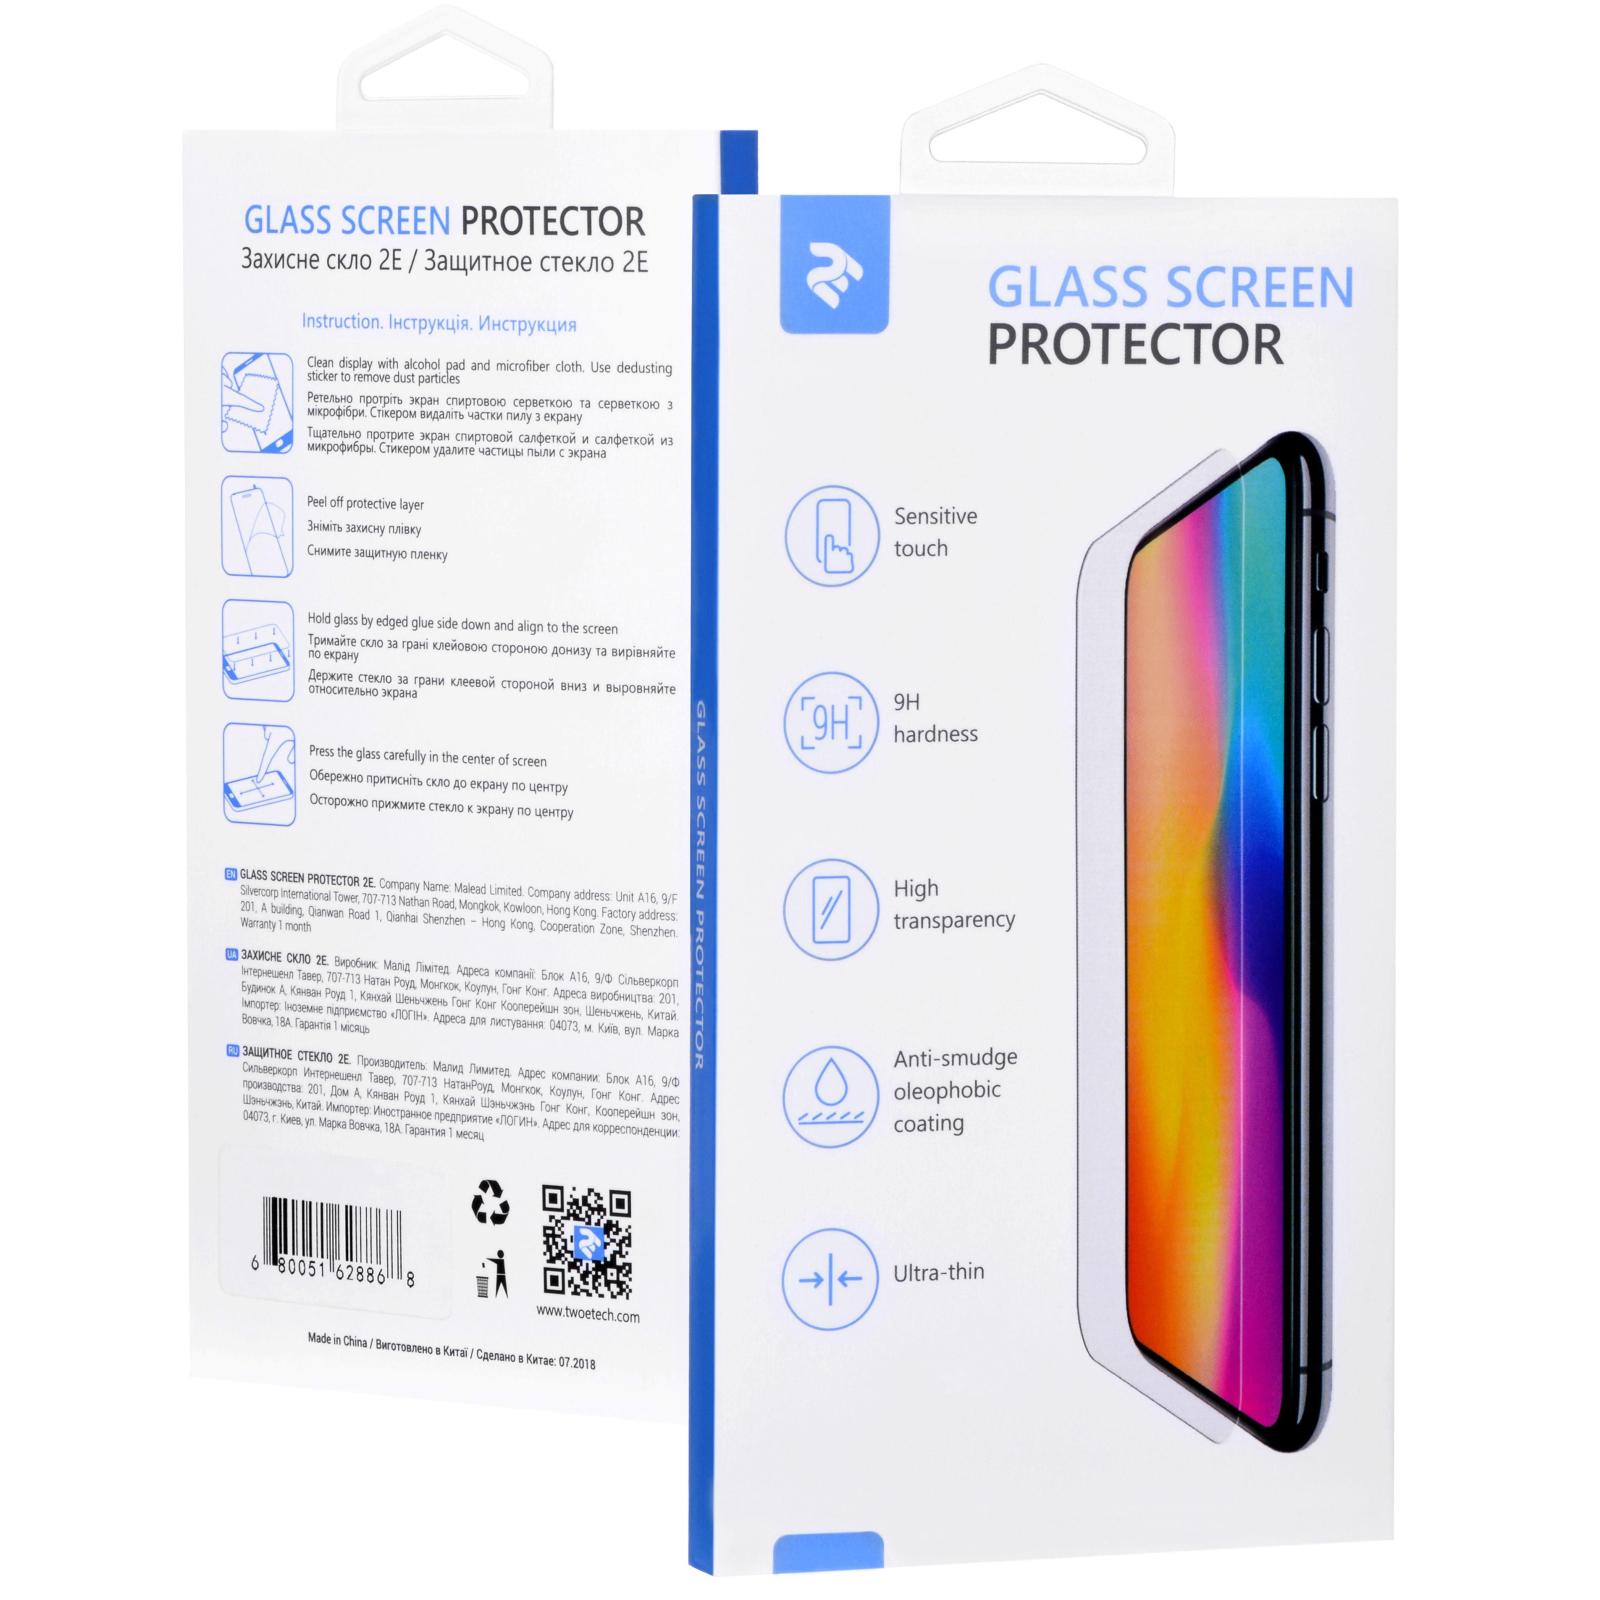 Стекло защитное 2E для Huawei Y5 2018 2.5D Clear (2E-TGHW-Y518-25D)